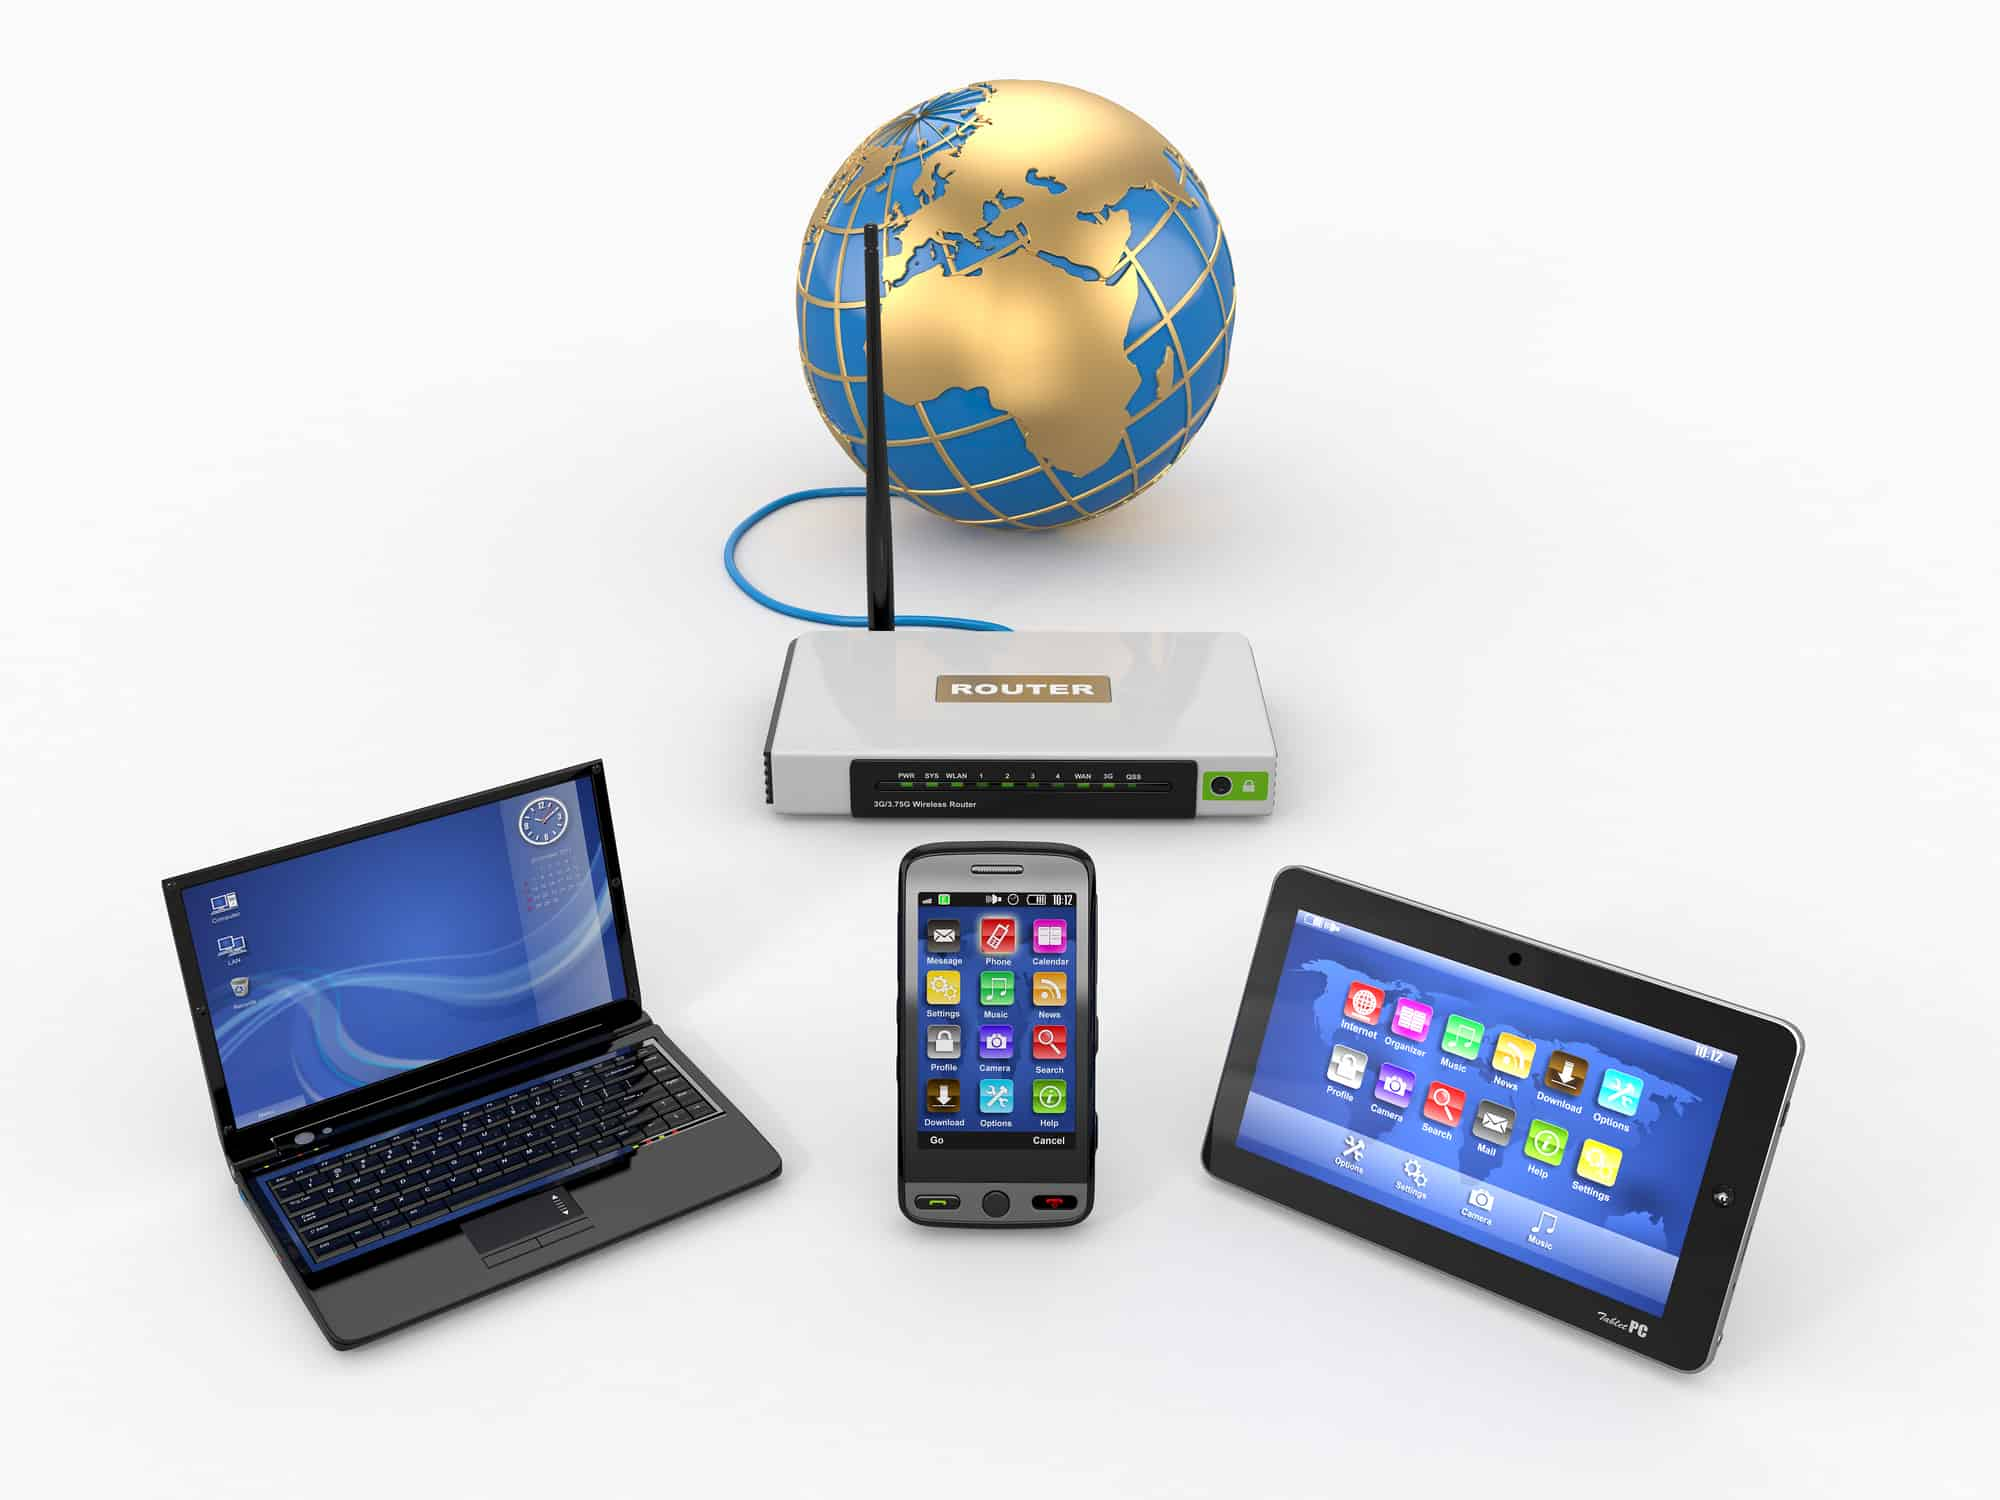 Eero Vs Google Wifi Vs Orbi Wifi Mesh Systems Comparison